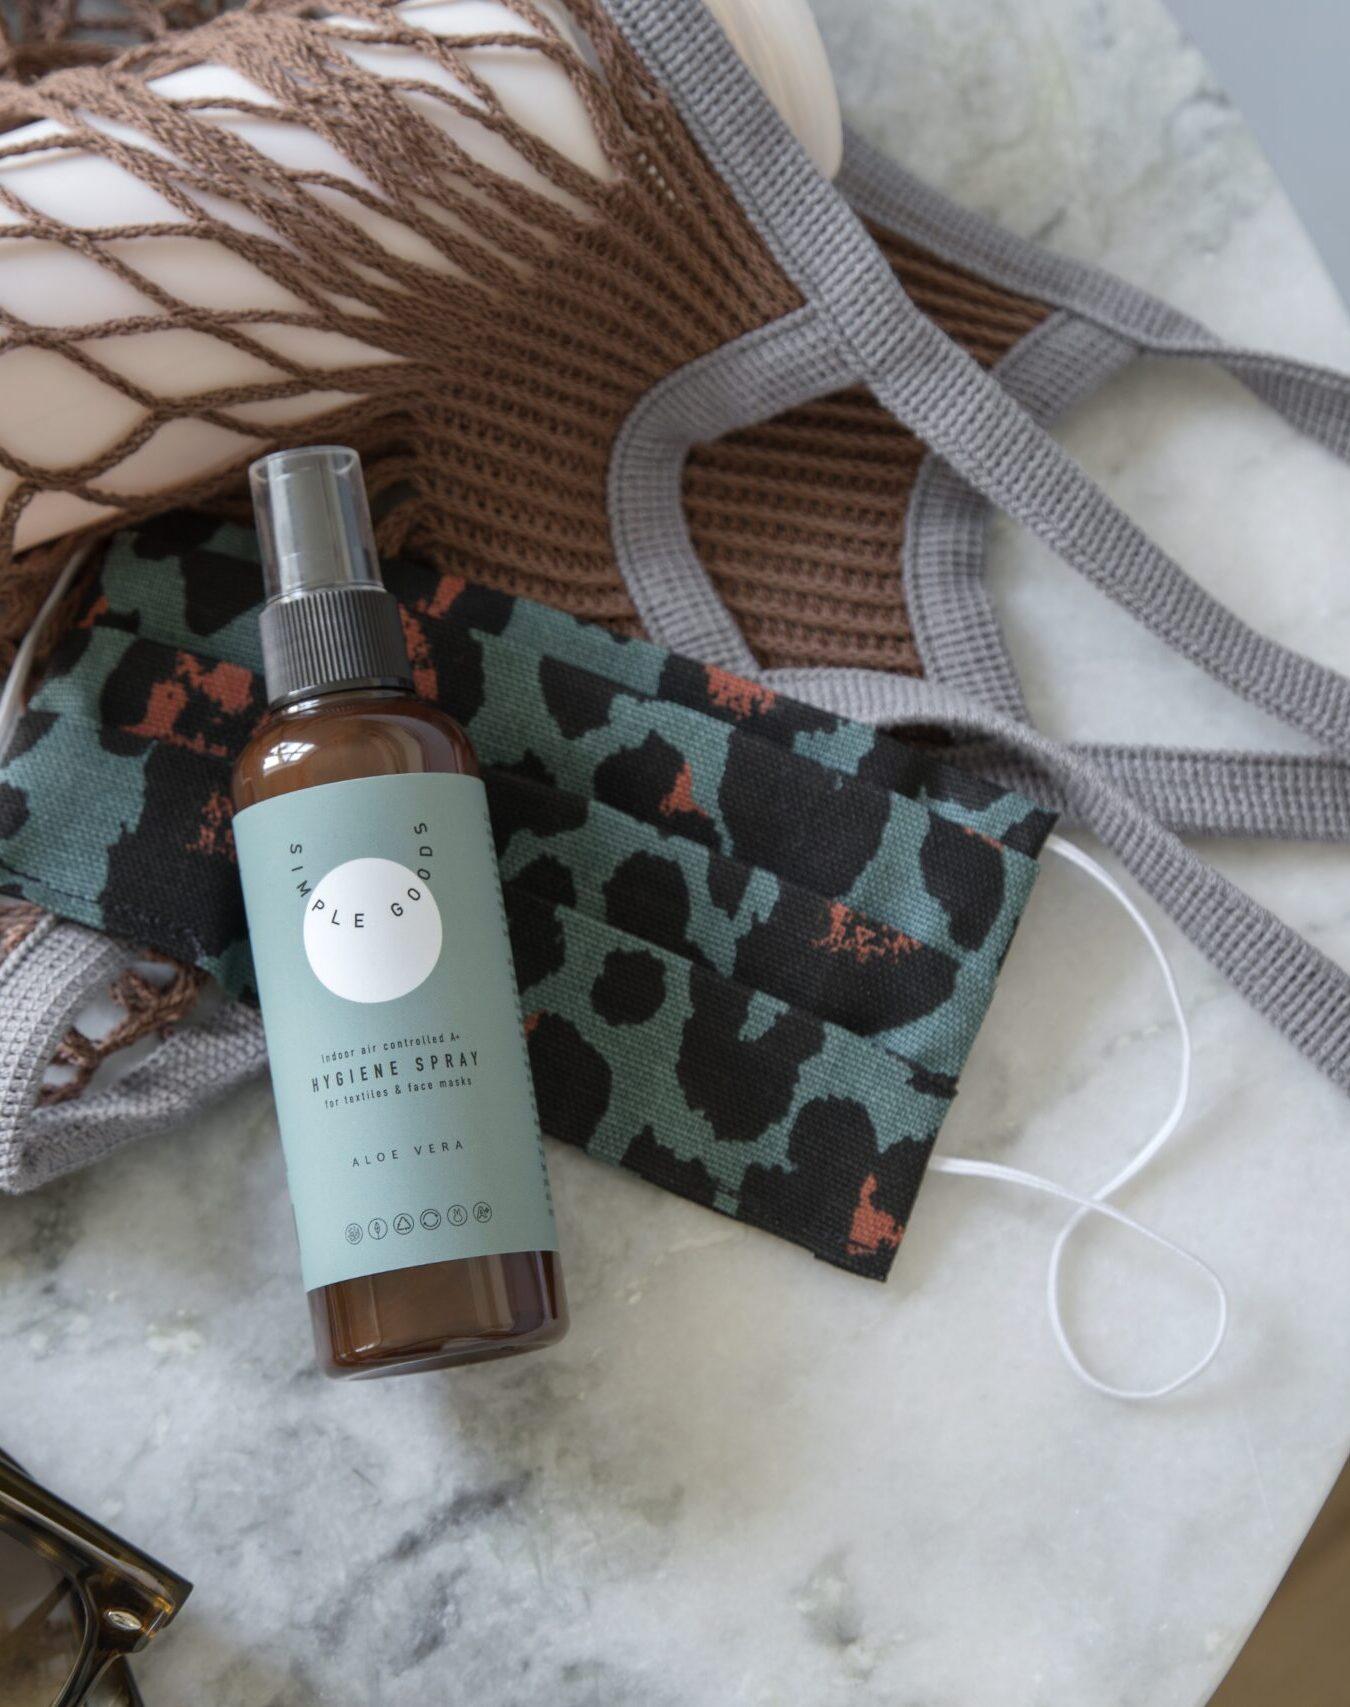 Simple Goods - Textile Hygiene Spray 100 ml, Aloe Vera